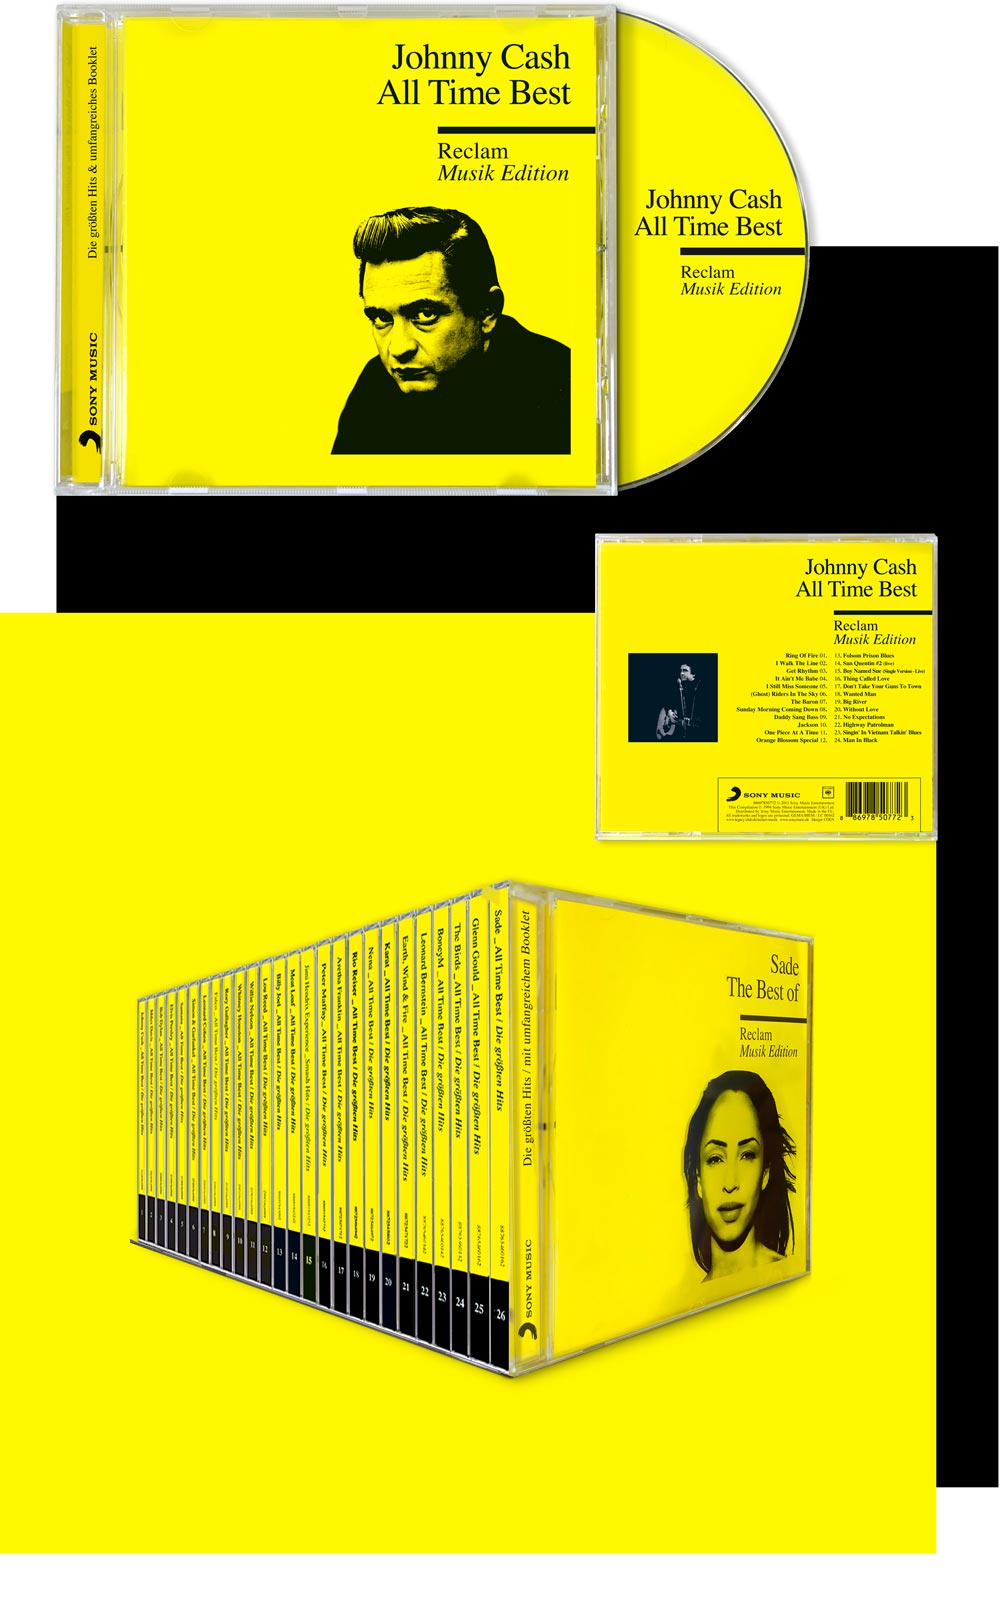 COEN Concept & Design Berlin - Reclam Music Edition